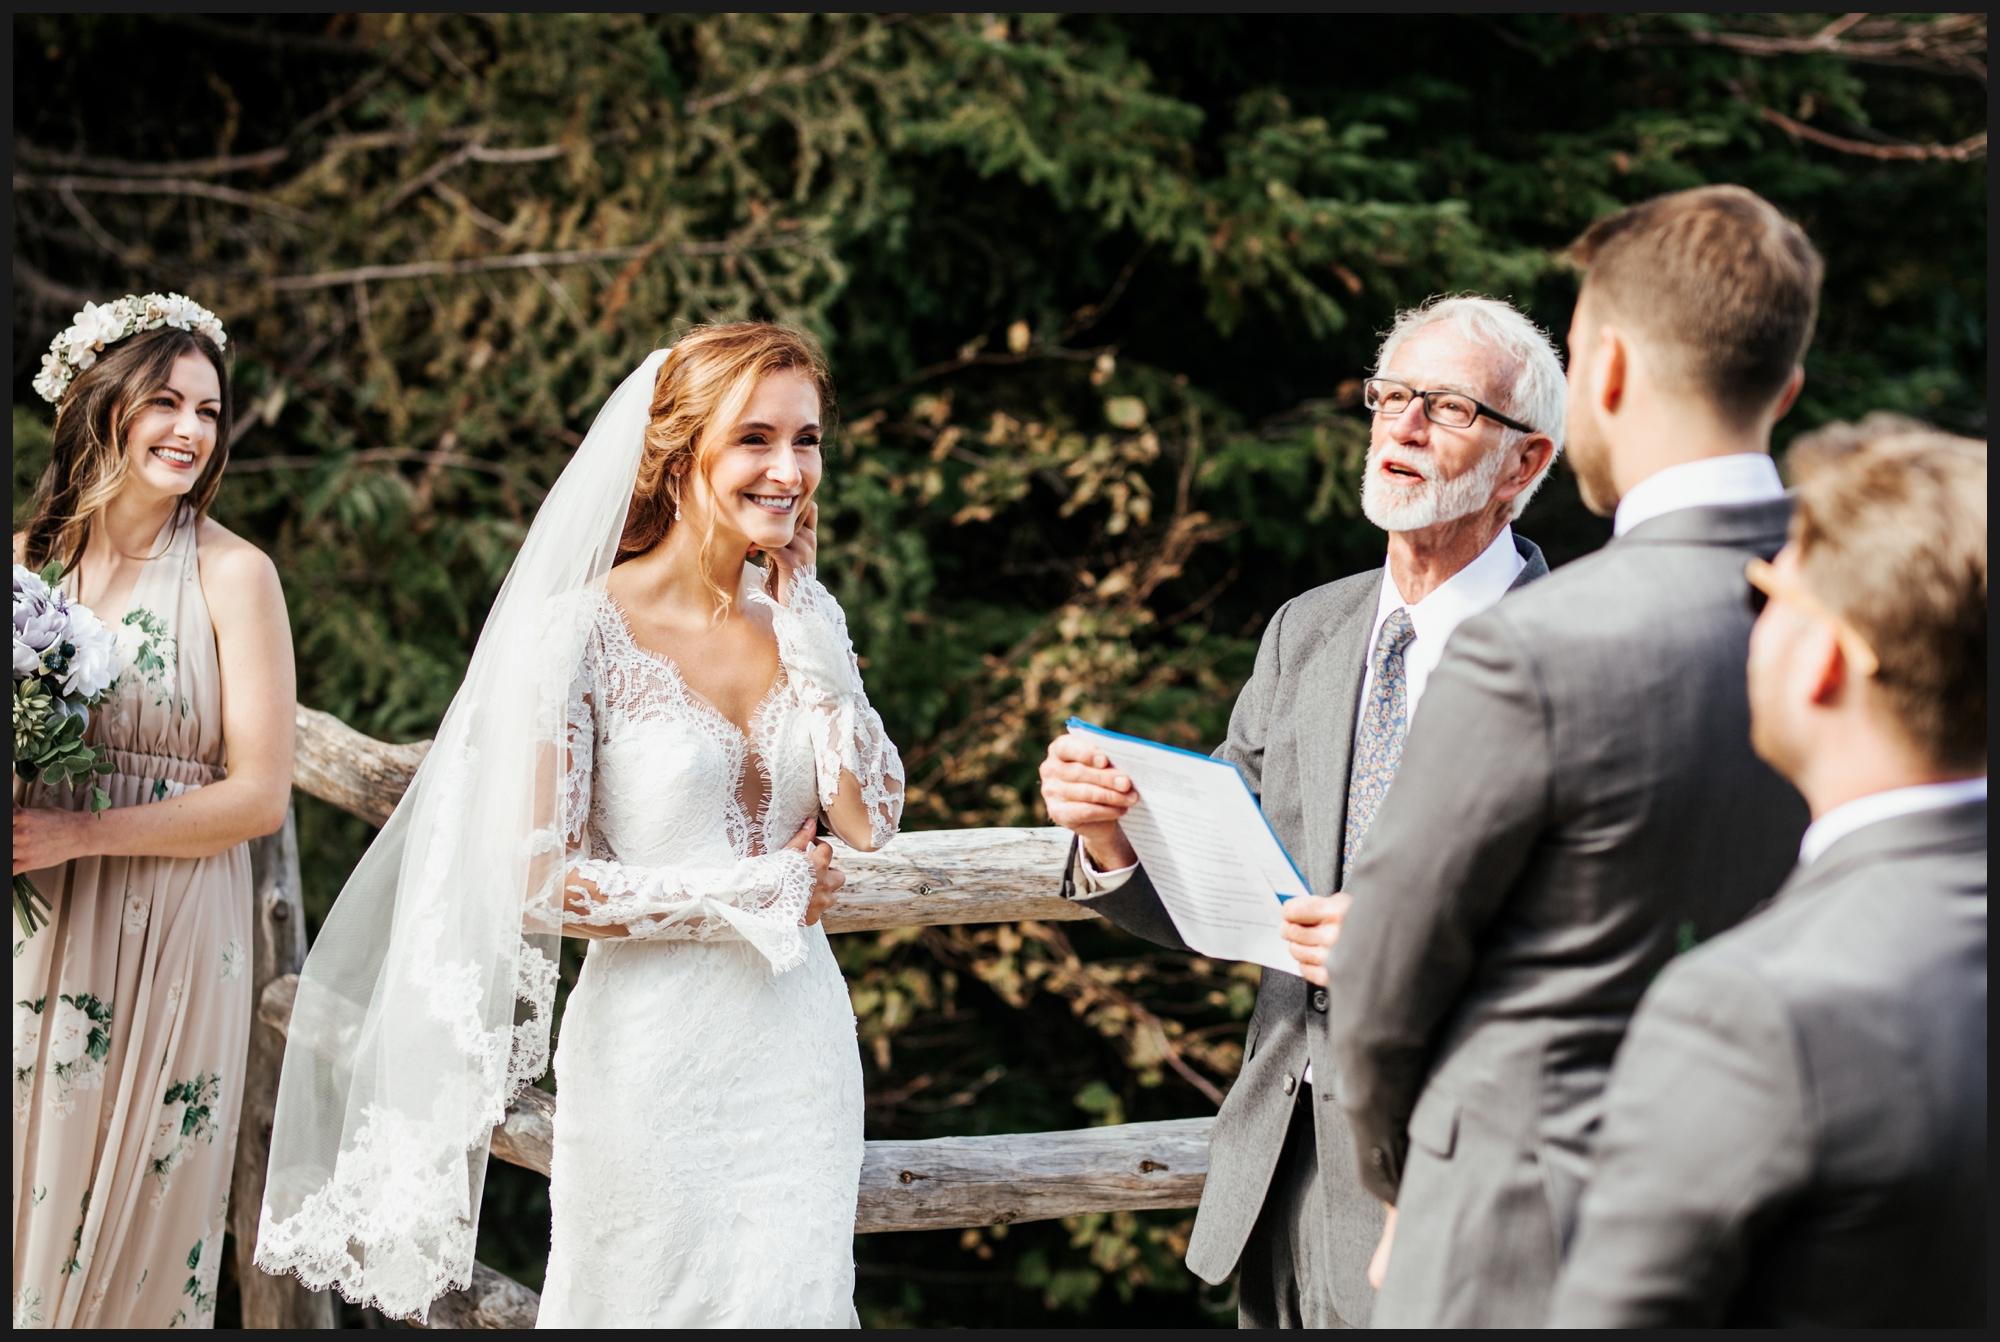 Orlando-Wedding-Photographer-destination-wedding-photographer-florida-wedding-photographer-hawaii-wedding-photographer_0139.jpg